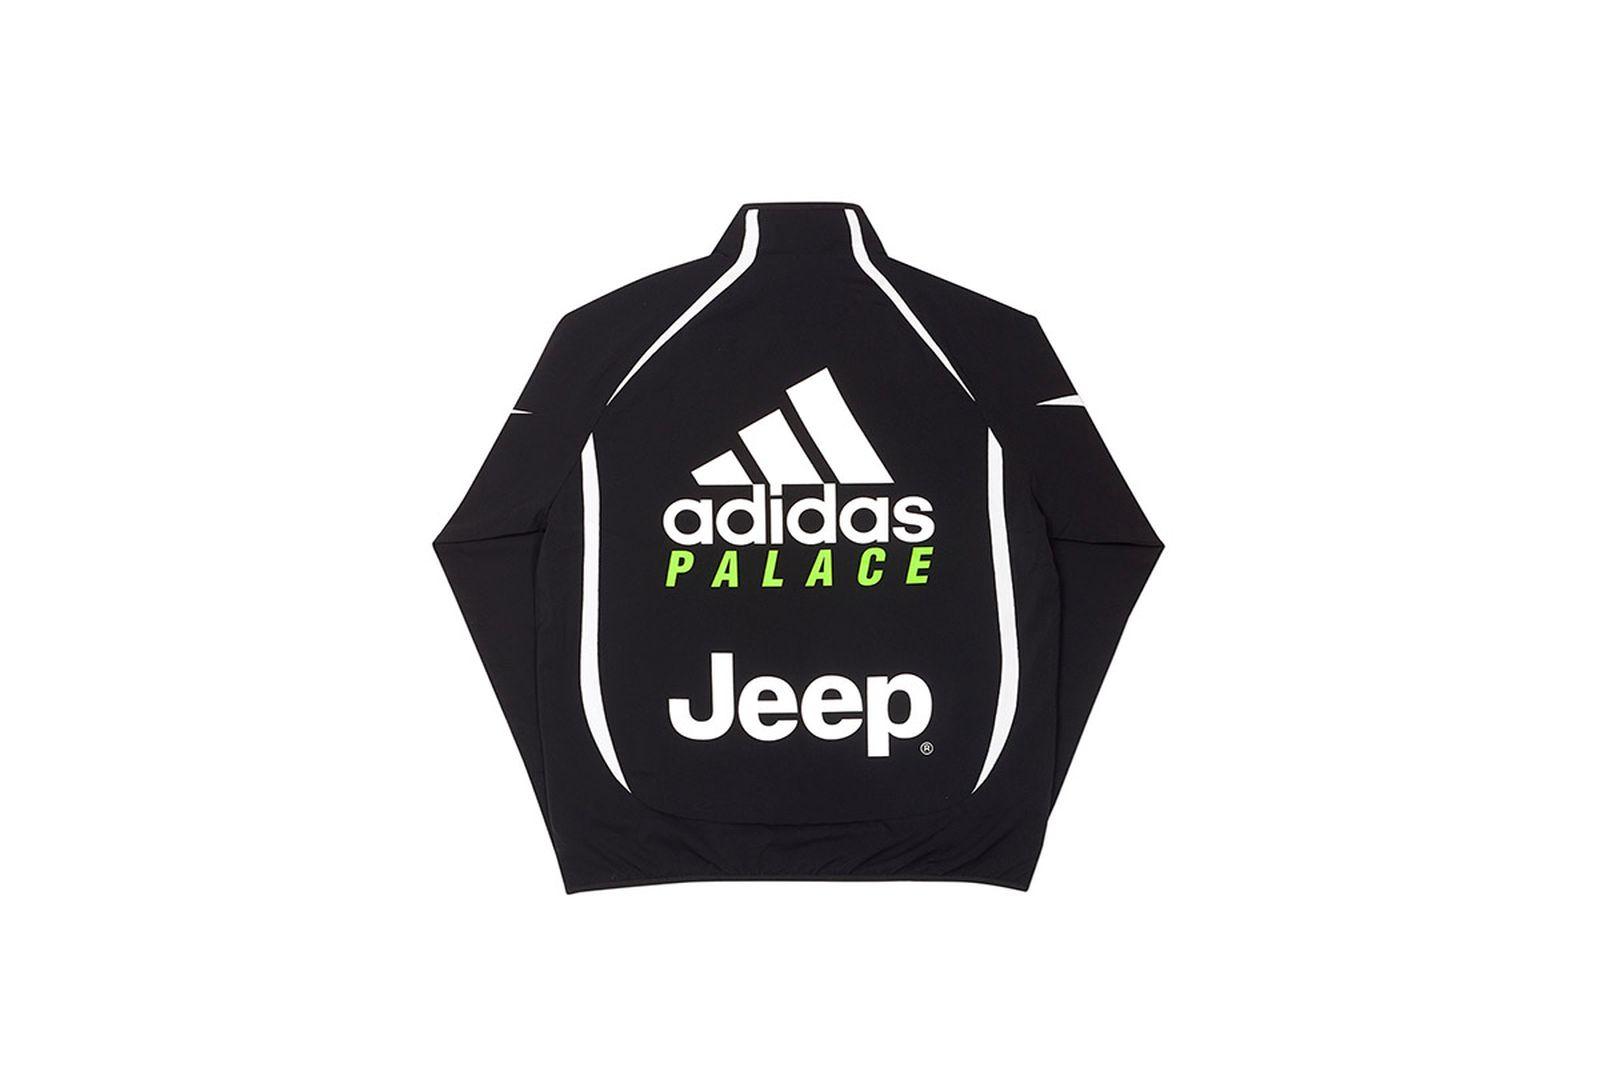 Palace-2019-Adidas-Juventus-Training-Top-zip-black-19584